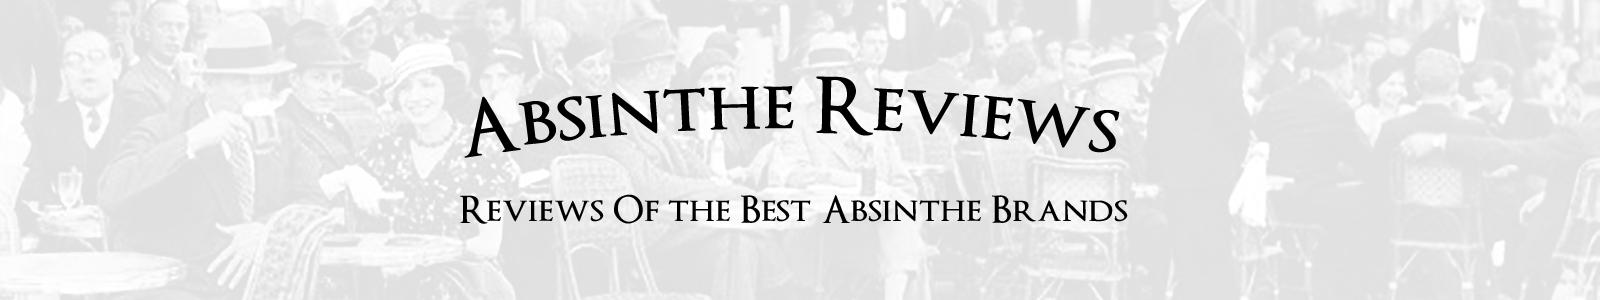 Absinthes Reviews